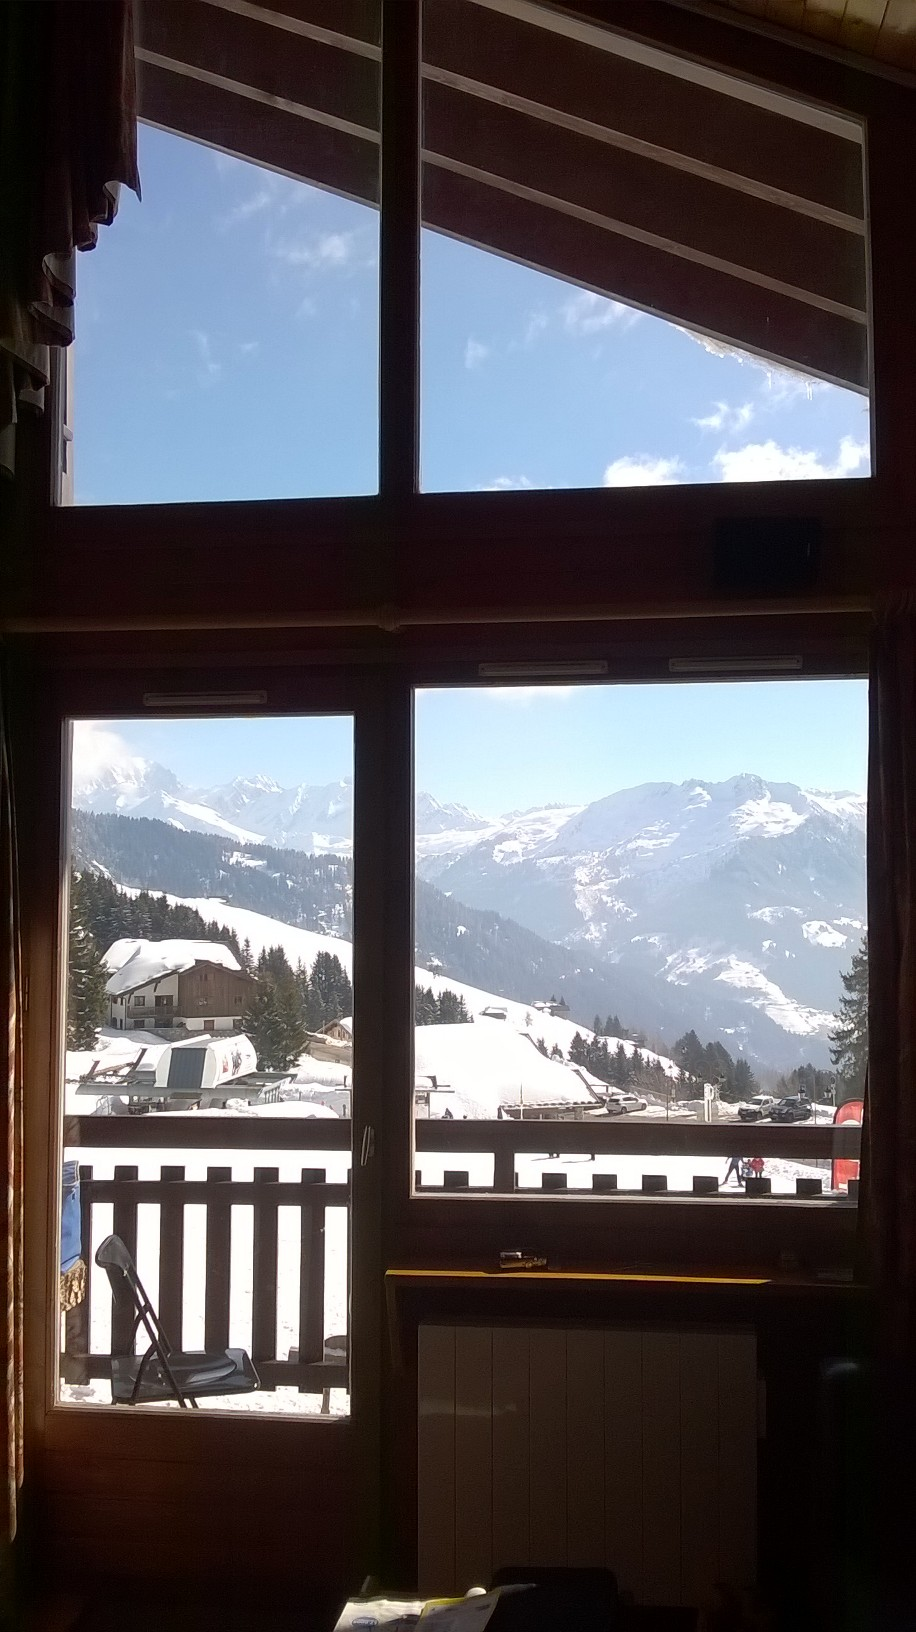 Appartement en Location à Bisanne 1500 - Villard sur Doron - Savoie - AlpesAppartement en Location à Bisanne 1500 - Villard sur Doron - Savoie - Alpes